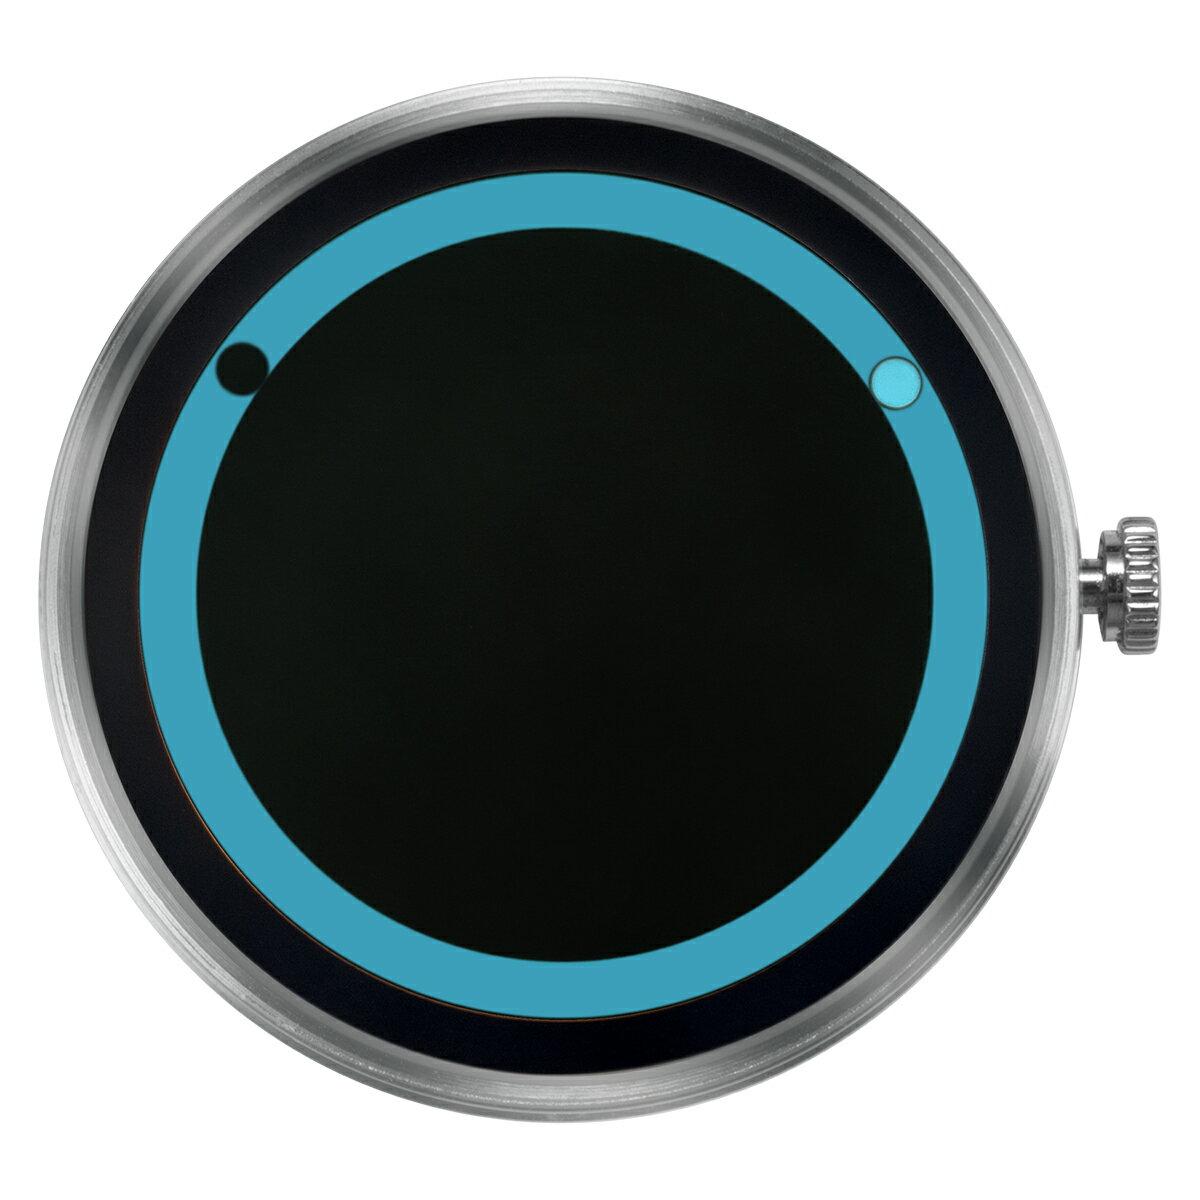 ZEROO 交換用クロックボディ ZEROO PLANET ECLIPSE ゼロ 電池式クォーツ 腕時計 [M13027]